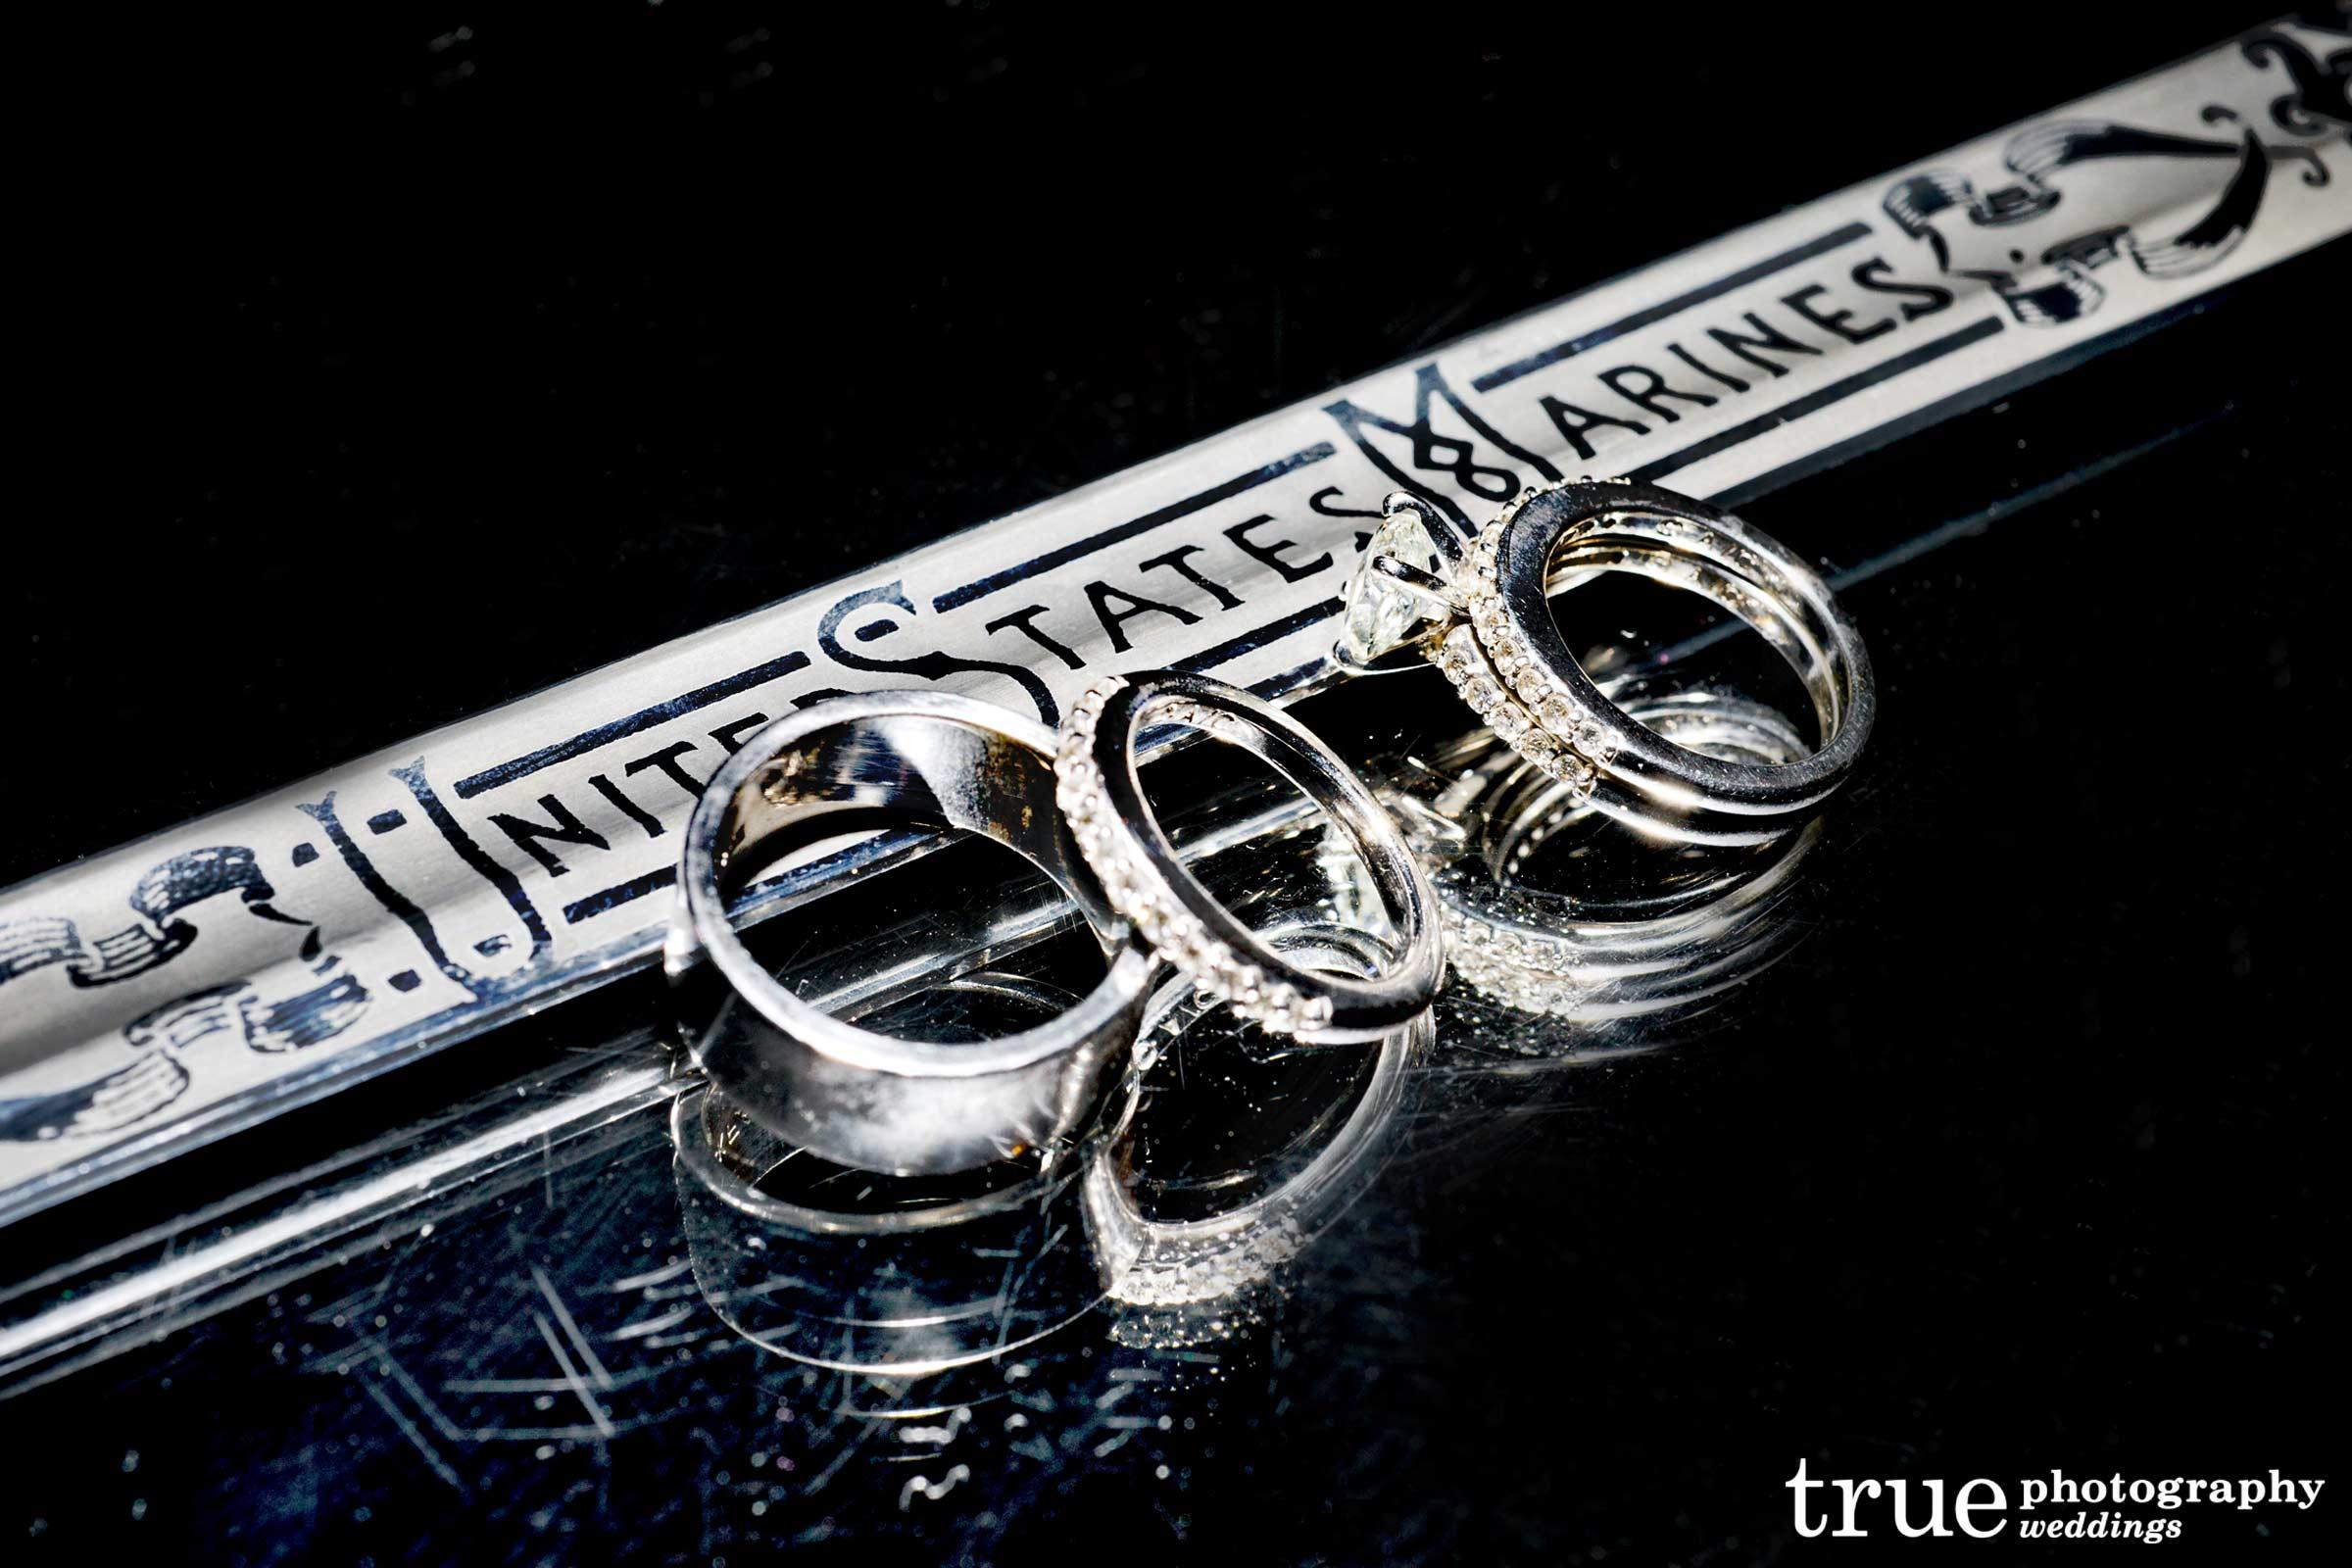 san diego military wedding photographer marine wedding rings Military wedding in San Diego photo of US Marine sword with wedding rings